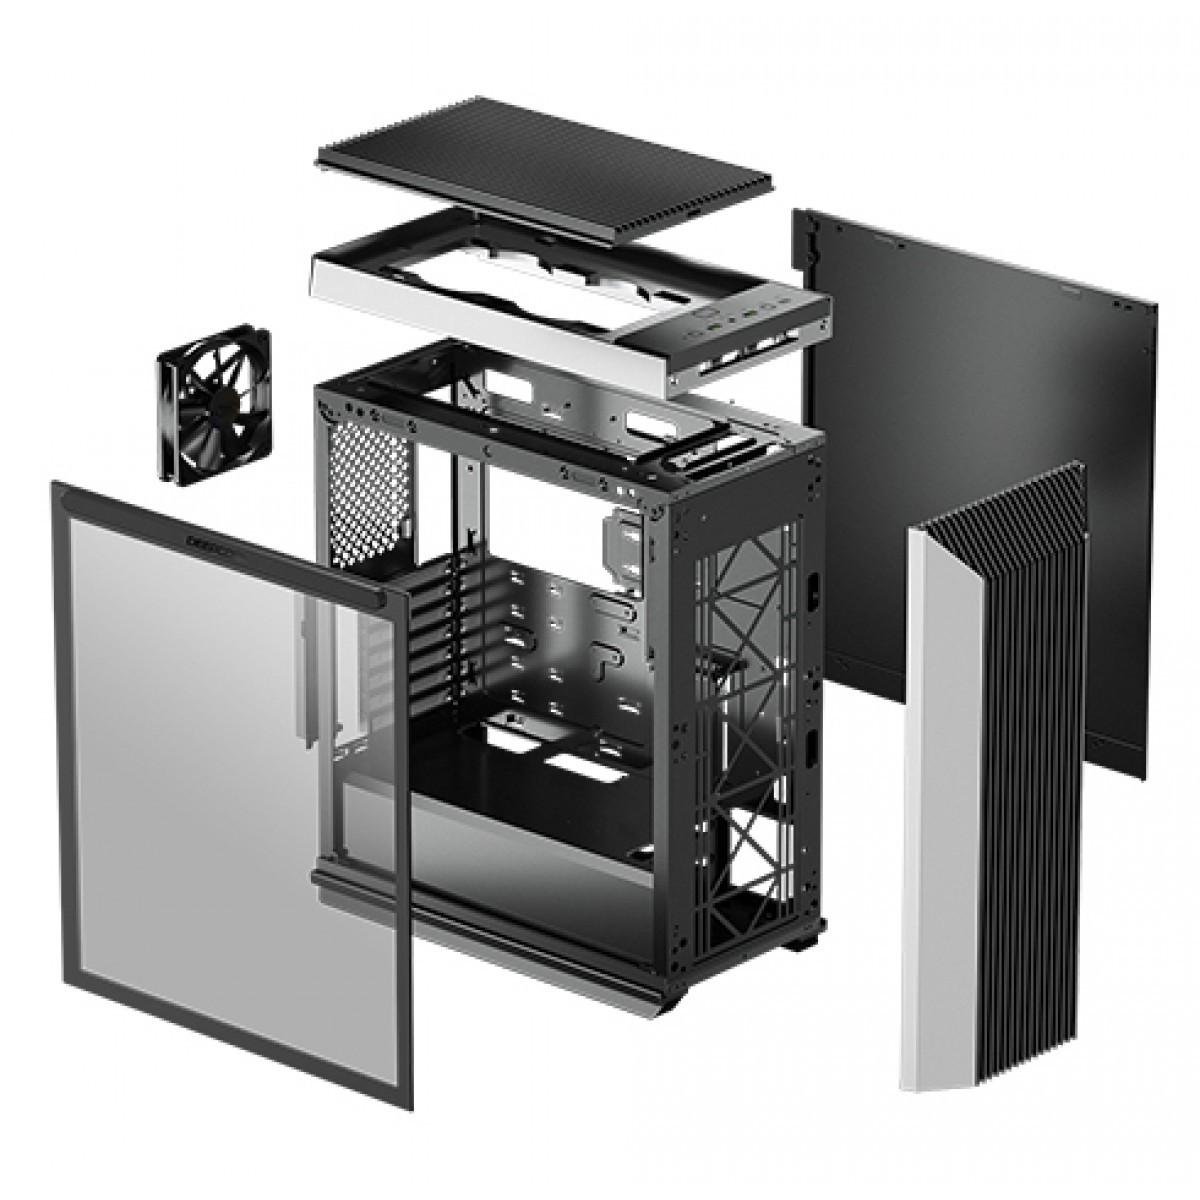 Gabinete Gamer DeepCool, CL500, Mid Tower, Vidro Temperado, Black, Sem Fan - R-CL500-BKNMA0N-C-1